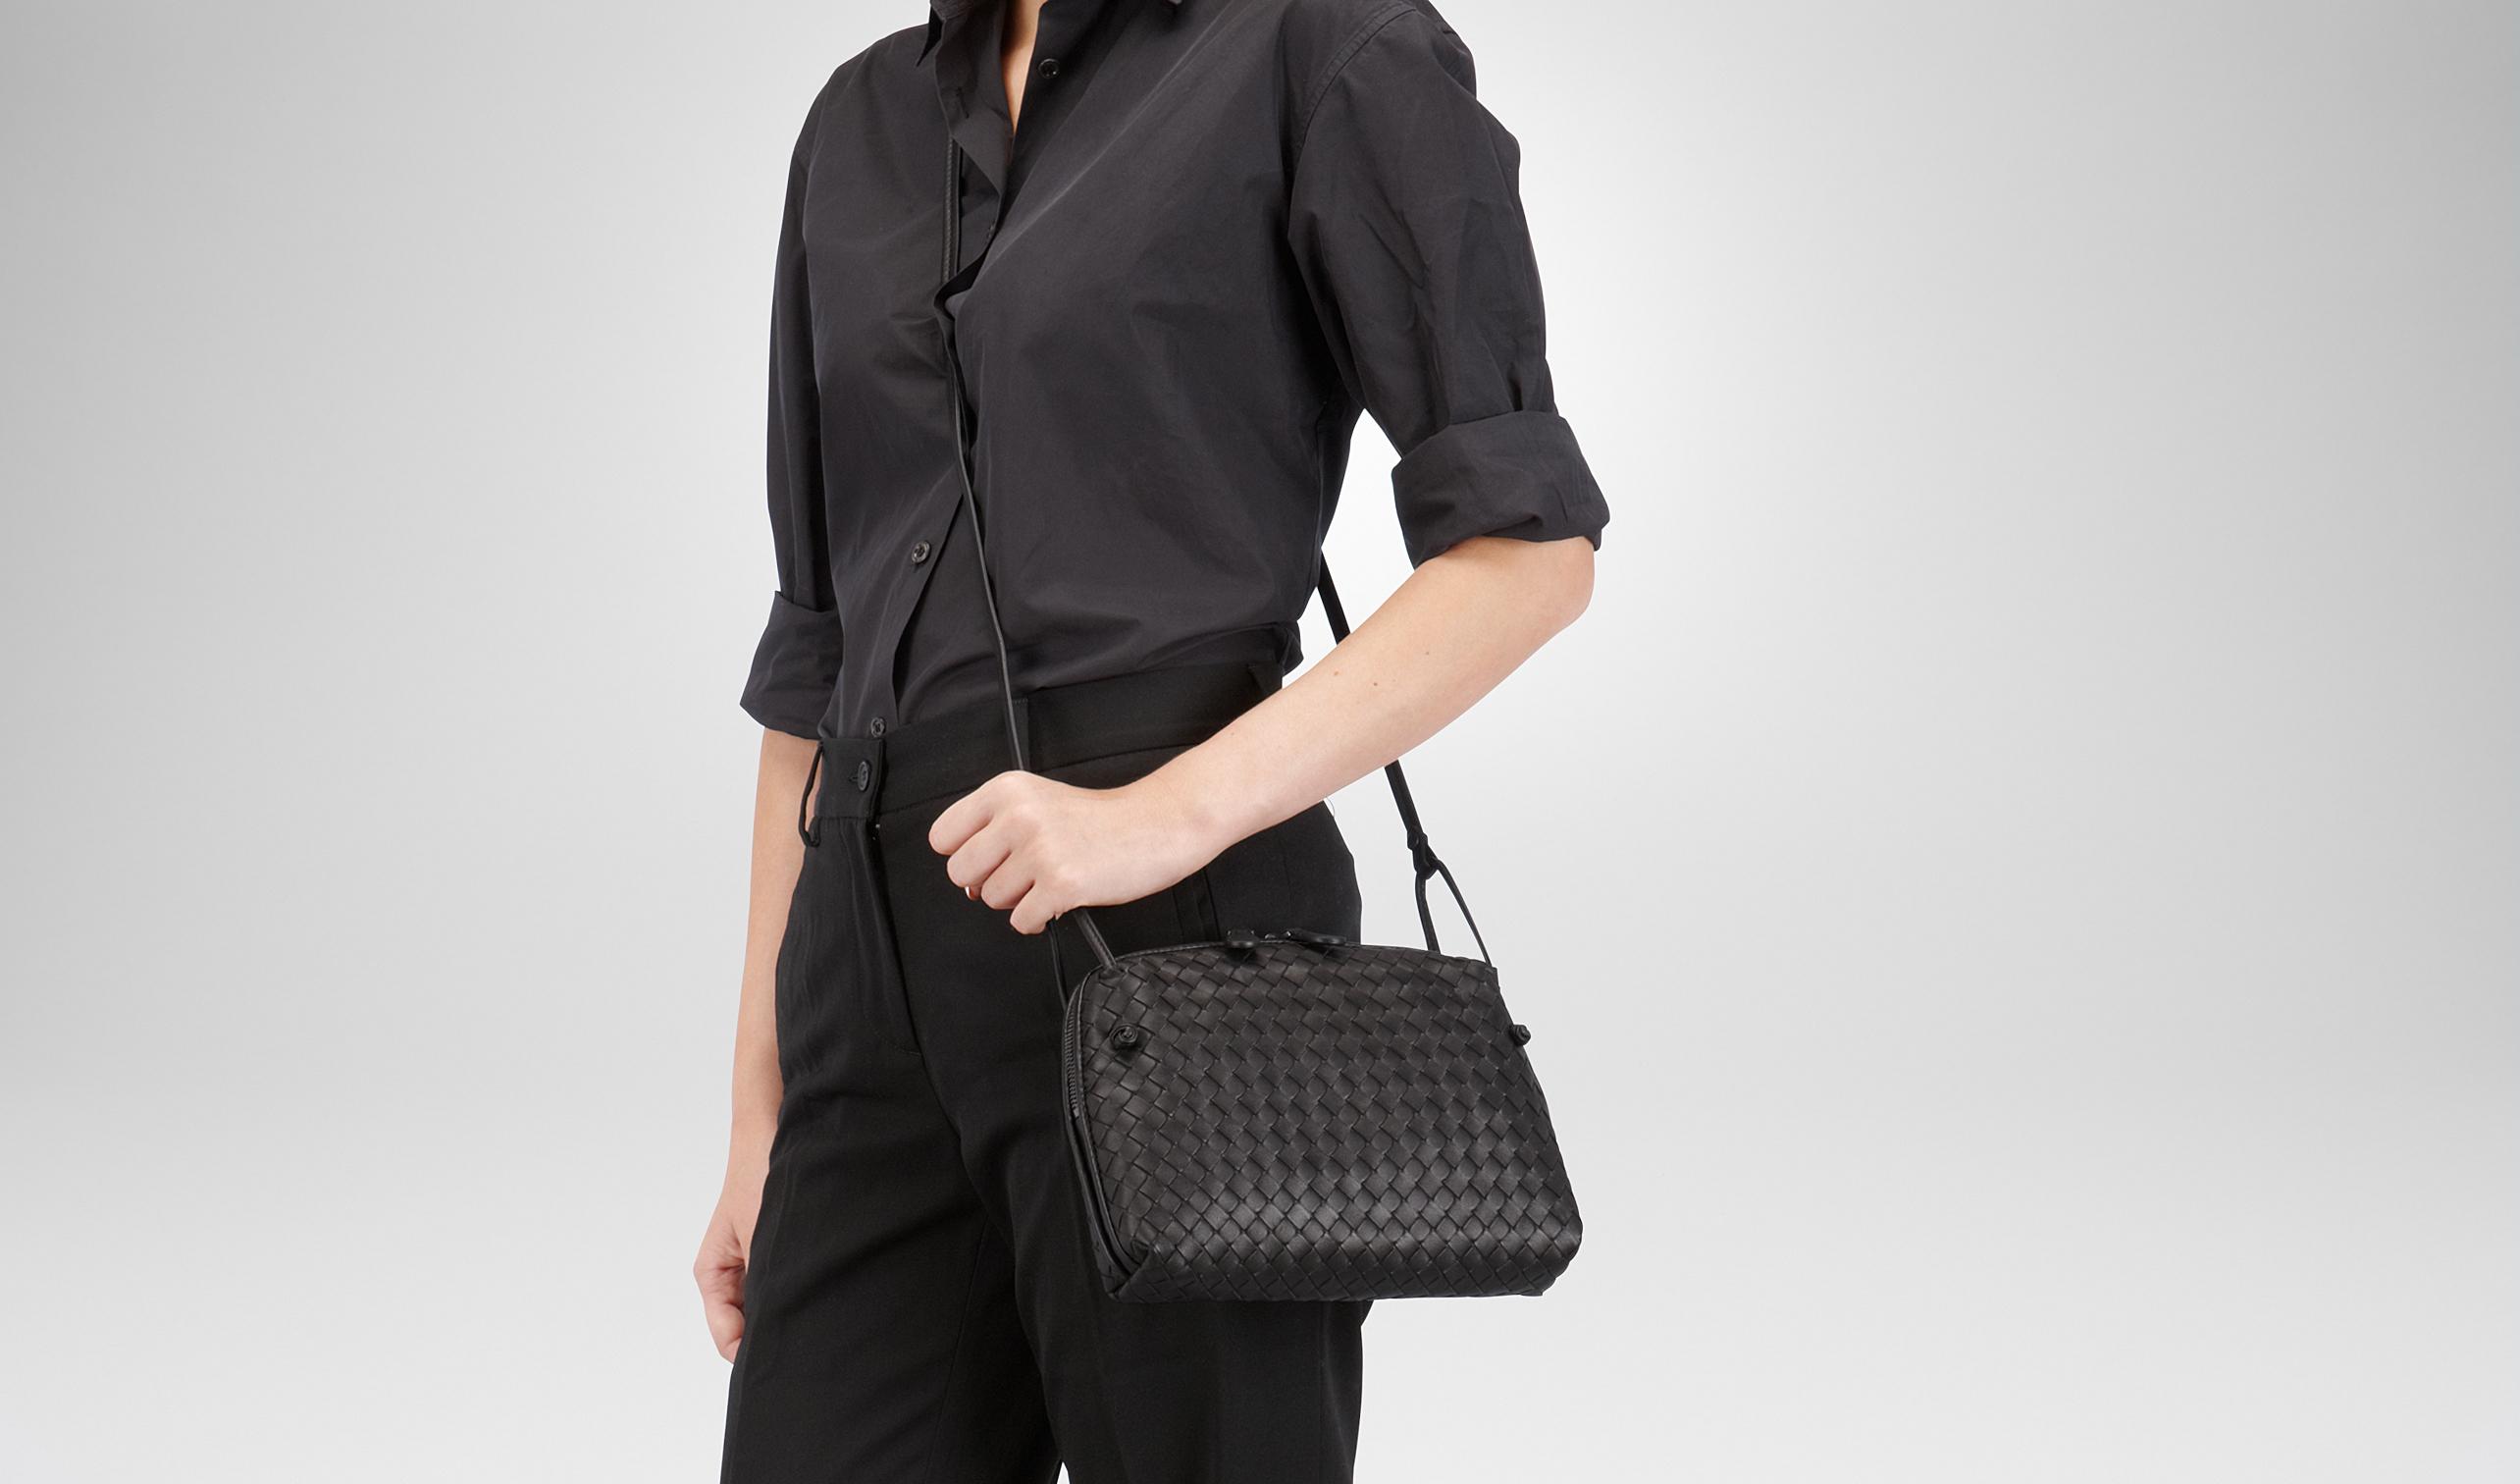 Messenger Mini Intrecciato Leather Shoulder Bag - Black Bottega Veneta TODNHlbCo